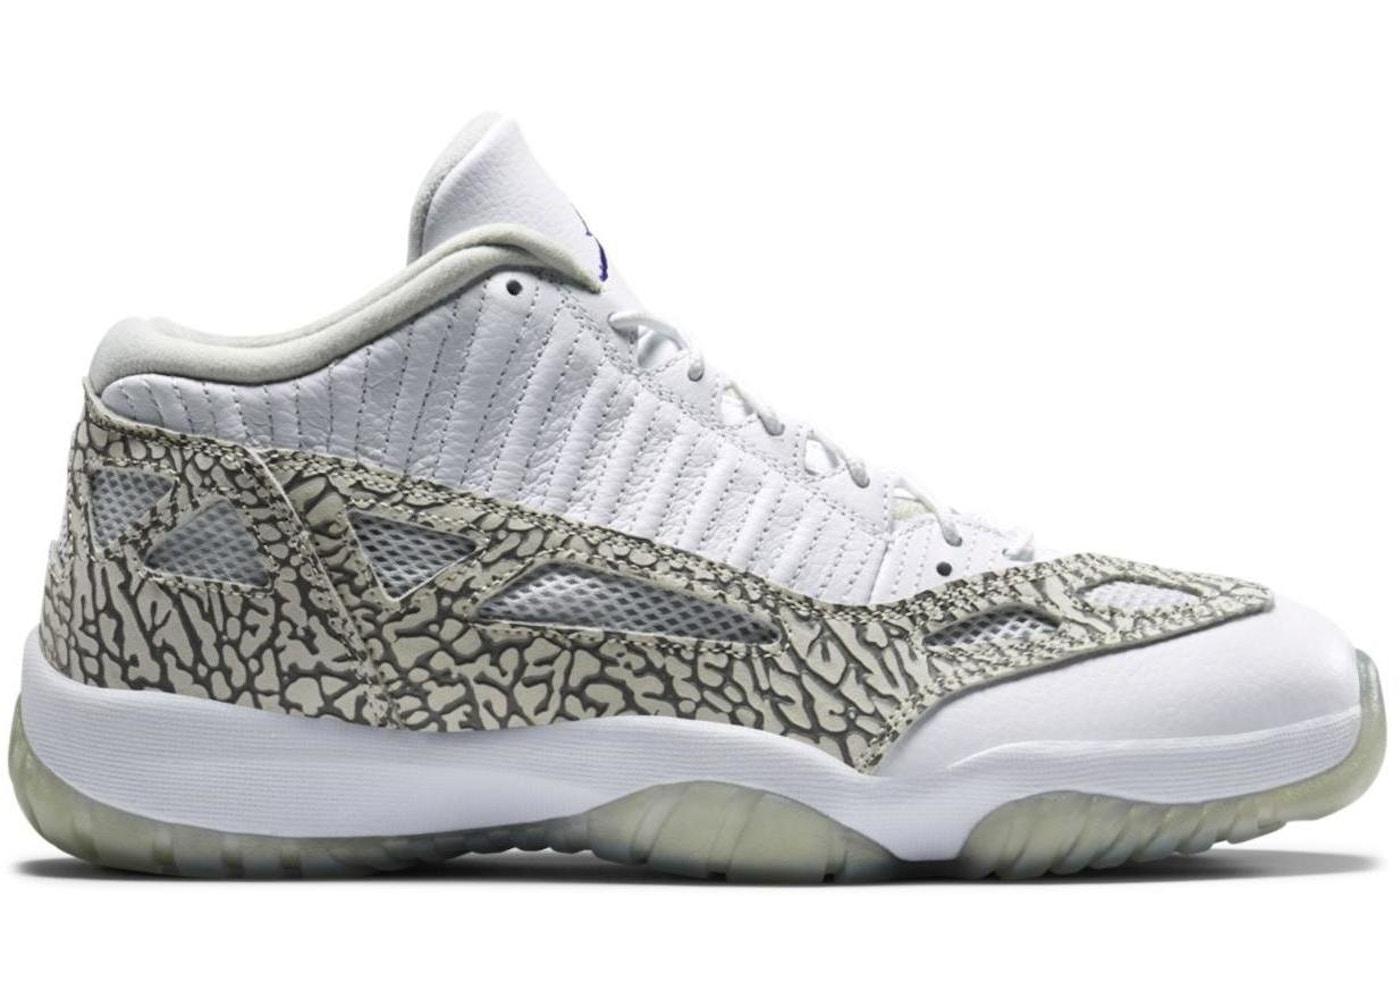 Jordan 11 Retro Low Ie Cobalt 2015 Hypeanalyzer